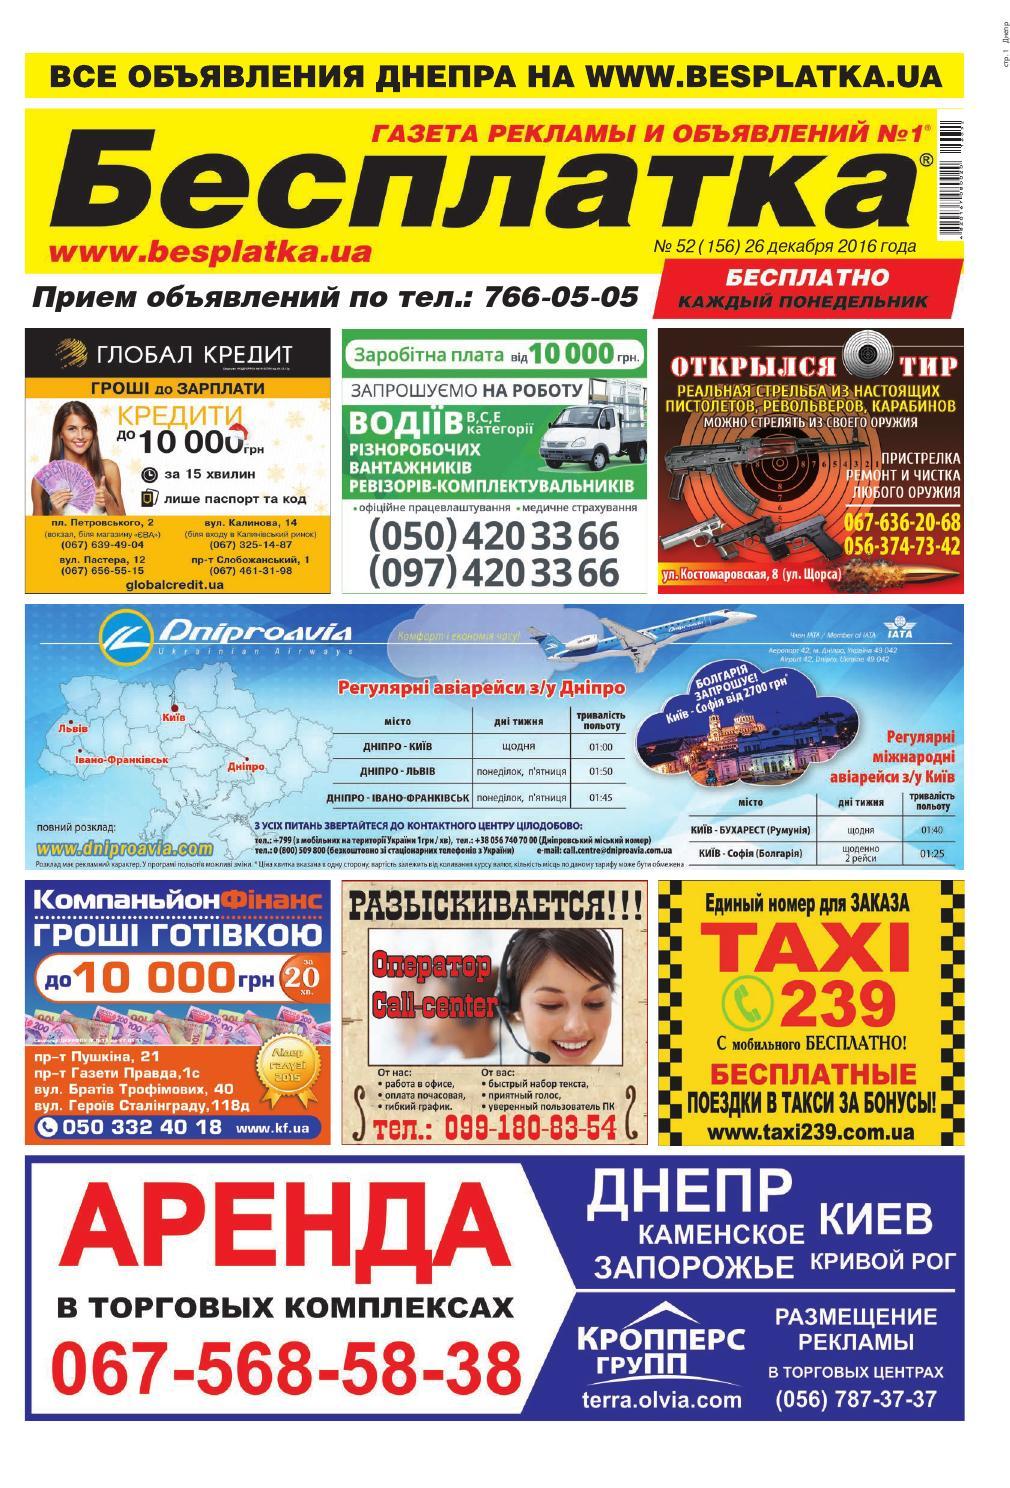 Besplatka  52 Днепр by besplatka ukraine - issuu b23c3b04712